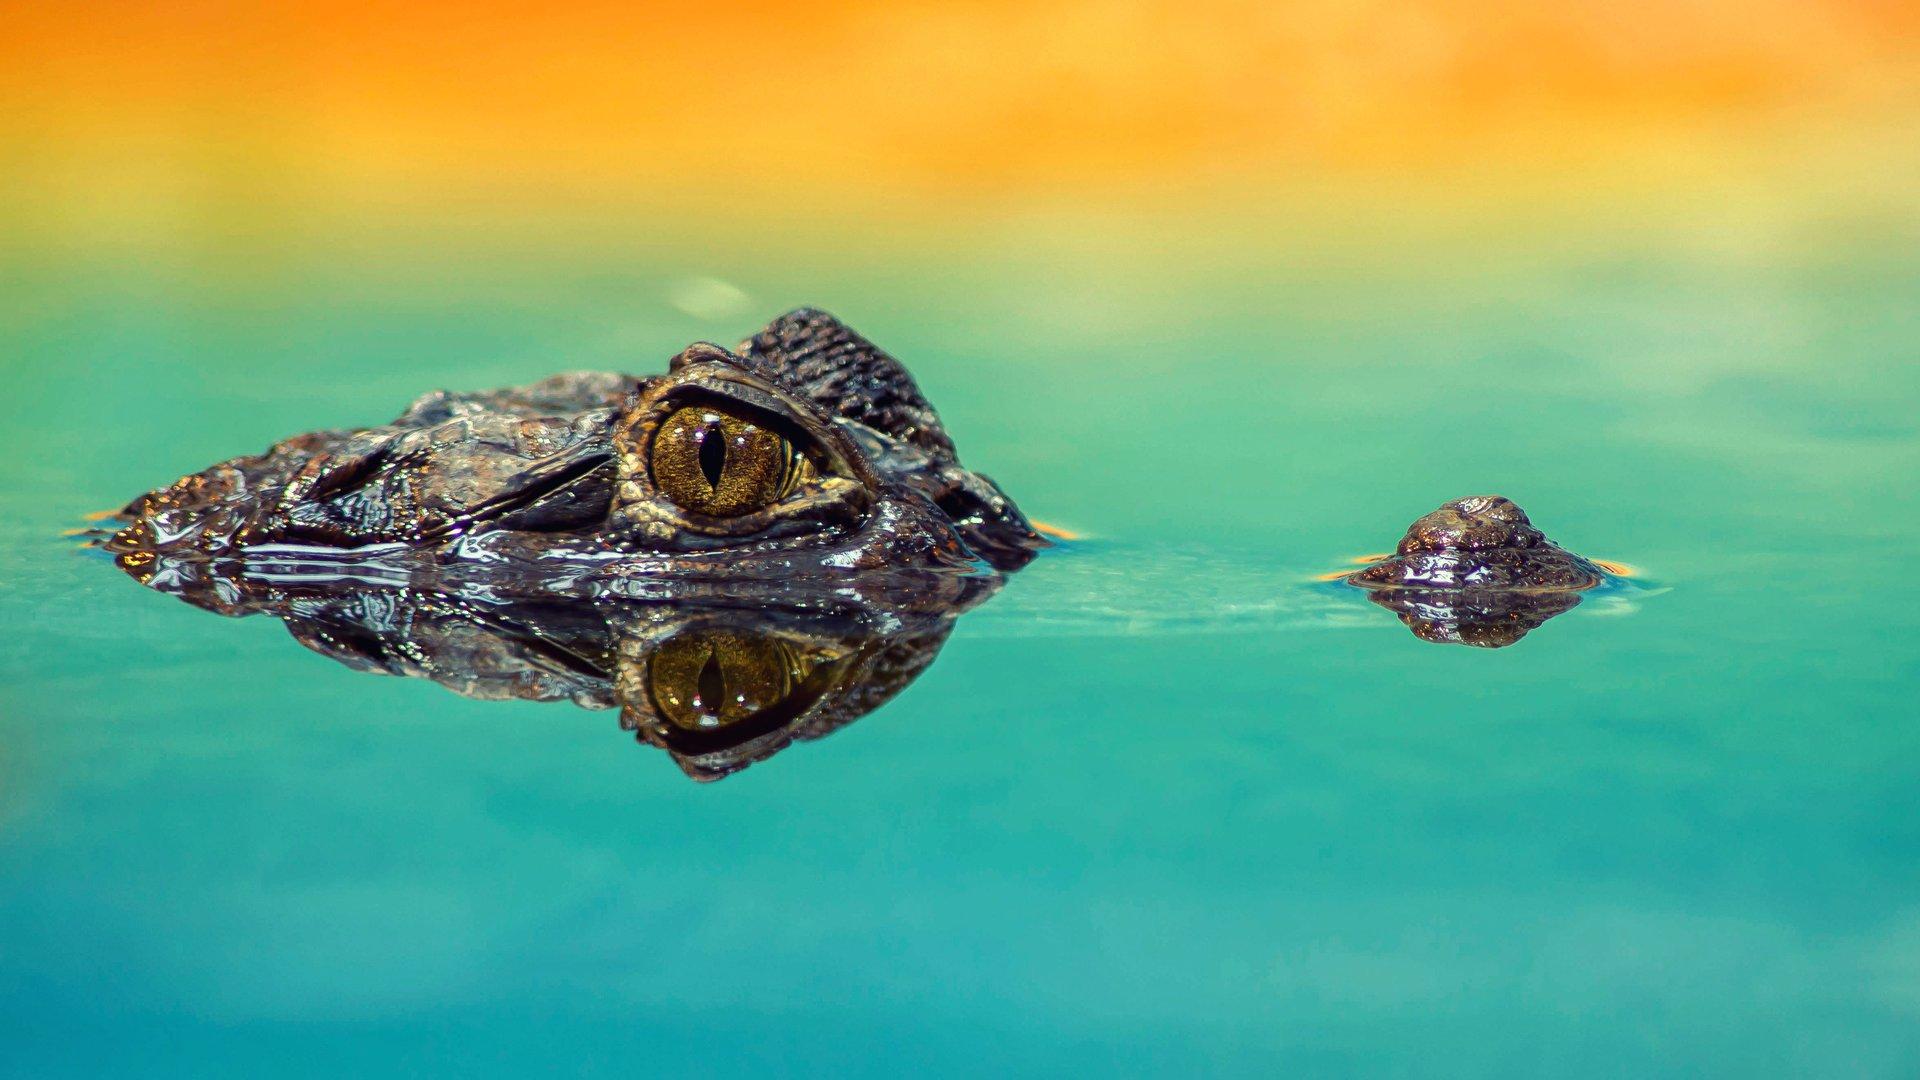 Crocodiles in Uganda